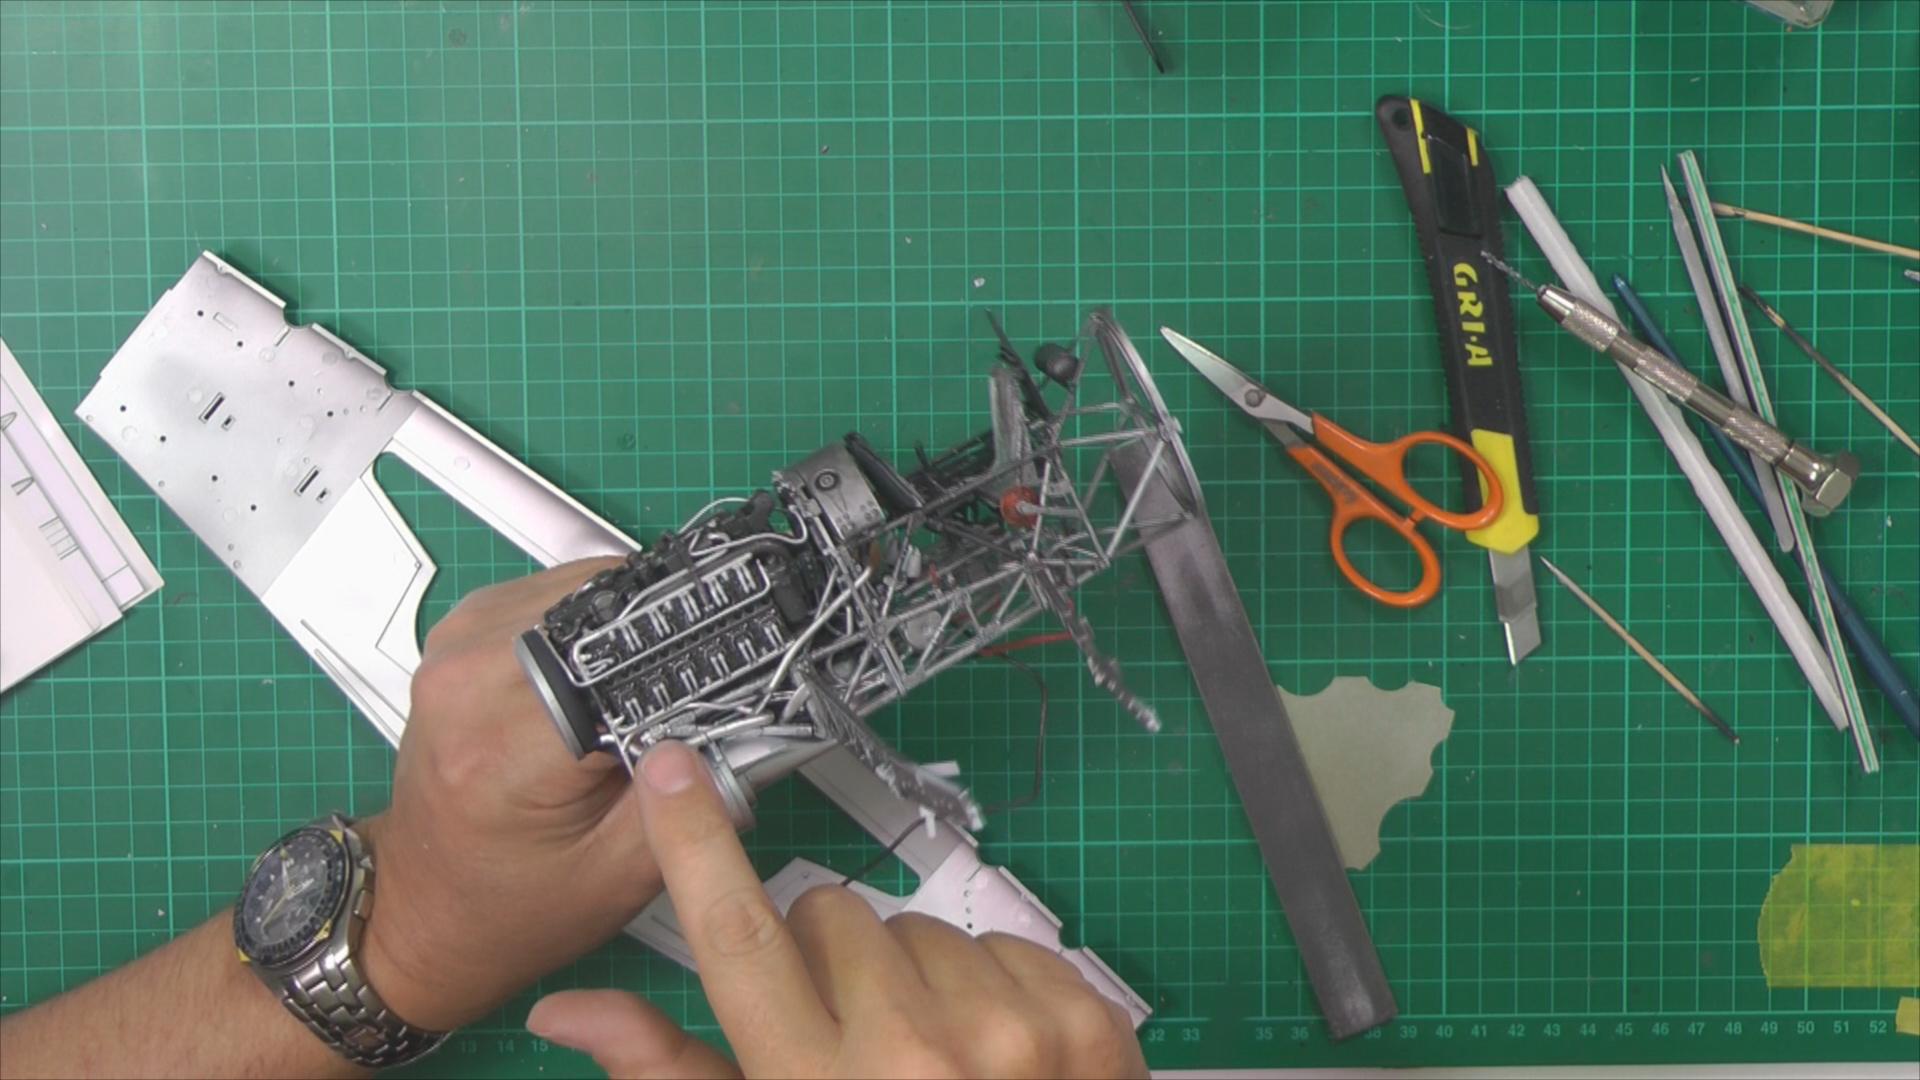 Hawker+Typhoon+Part+4+Pic+2.jpg